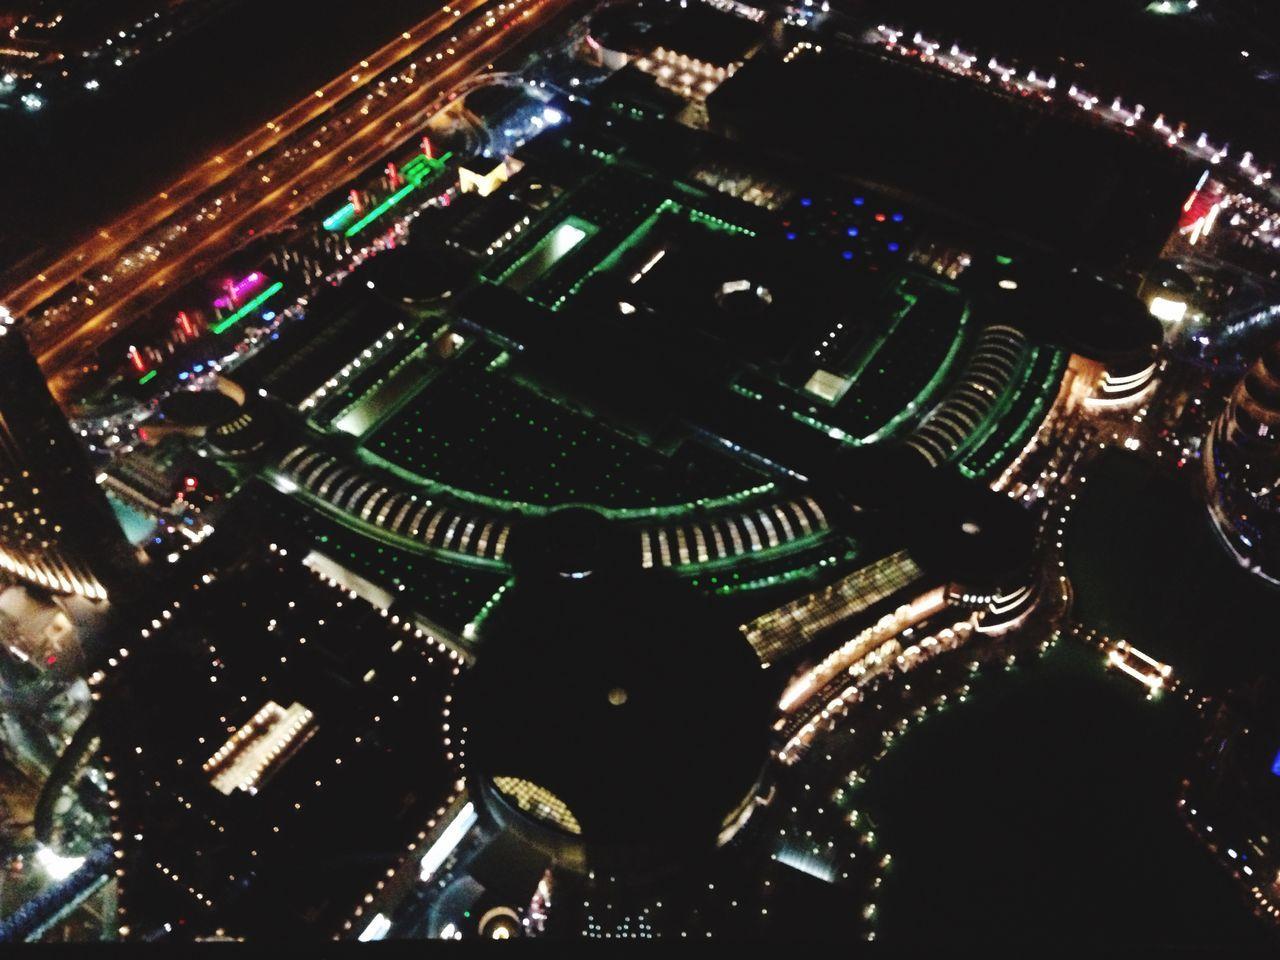 illuminated, night, architecture, city, indoors, modern, no people, cityscape